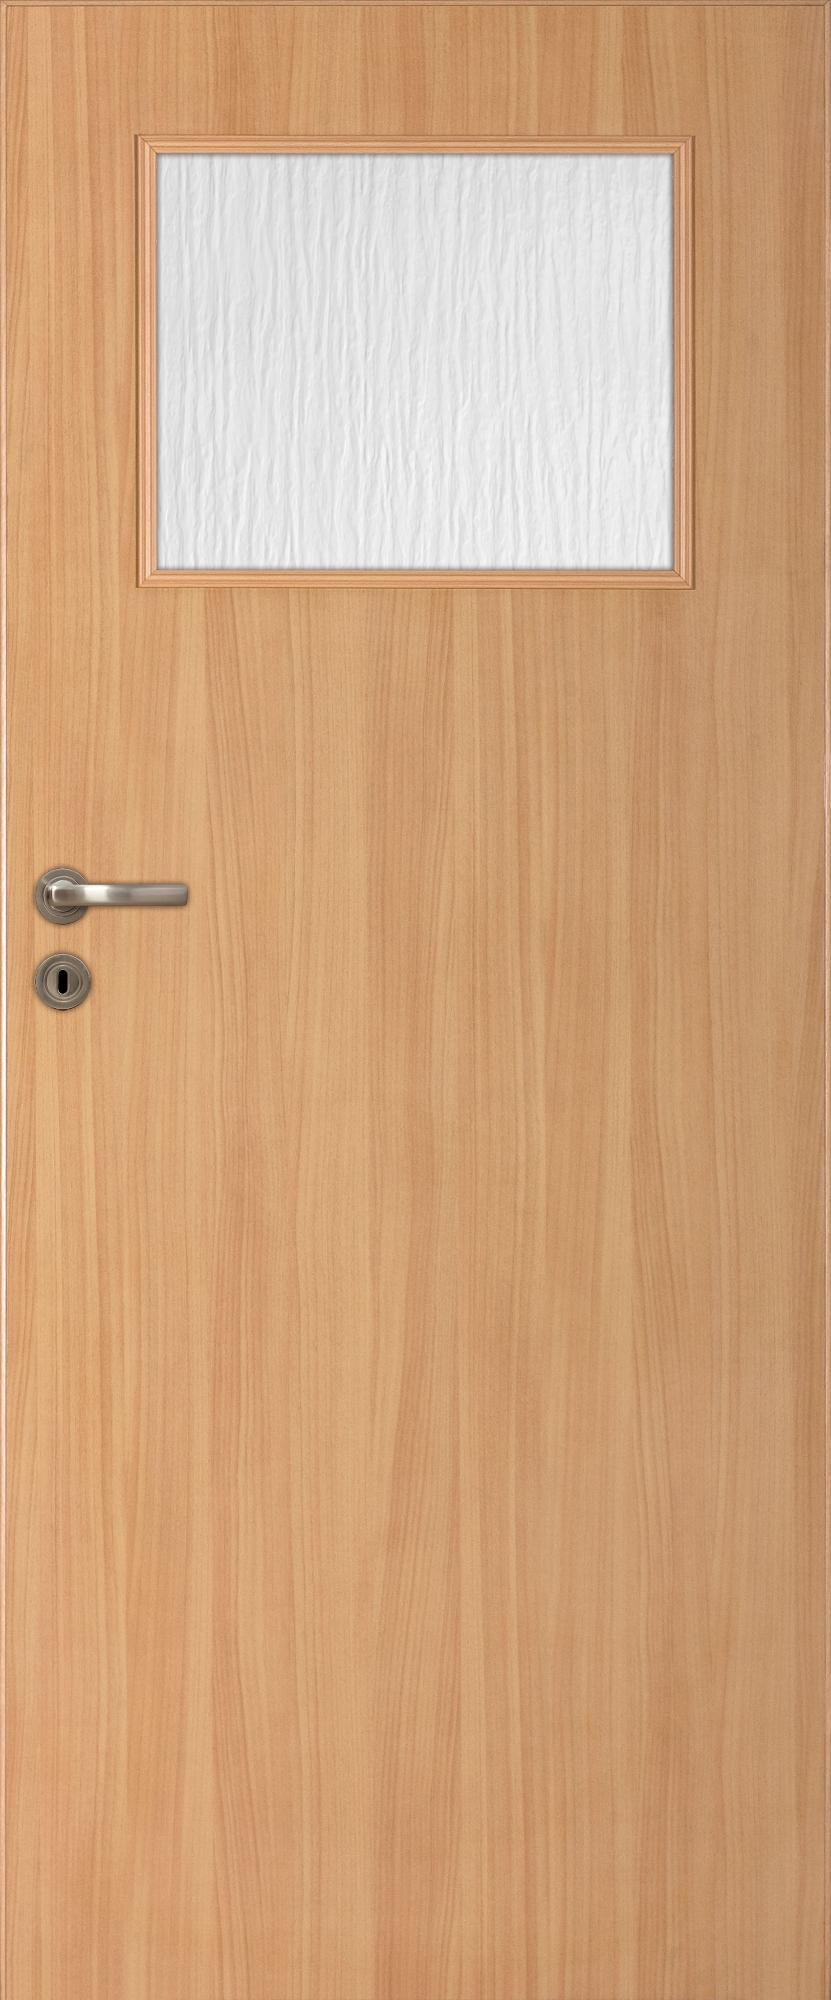 Interiérové dveře DRE Lack 20